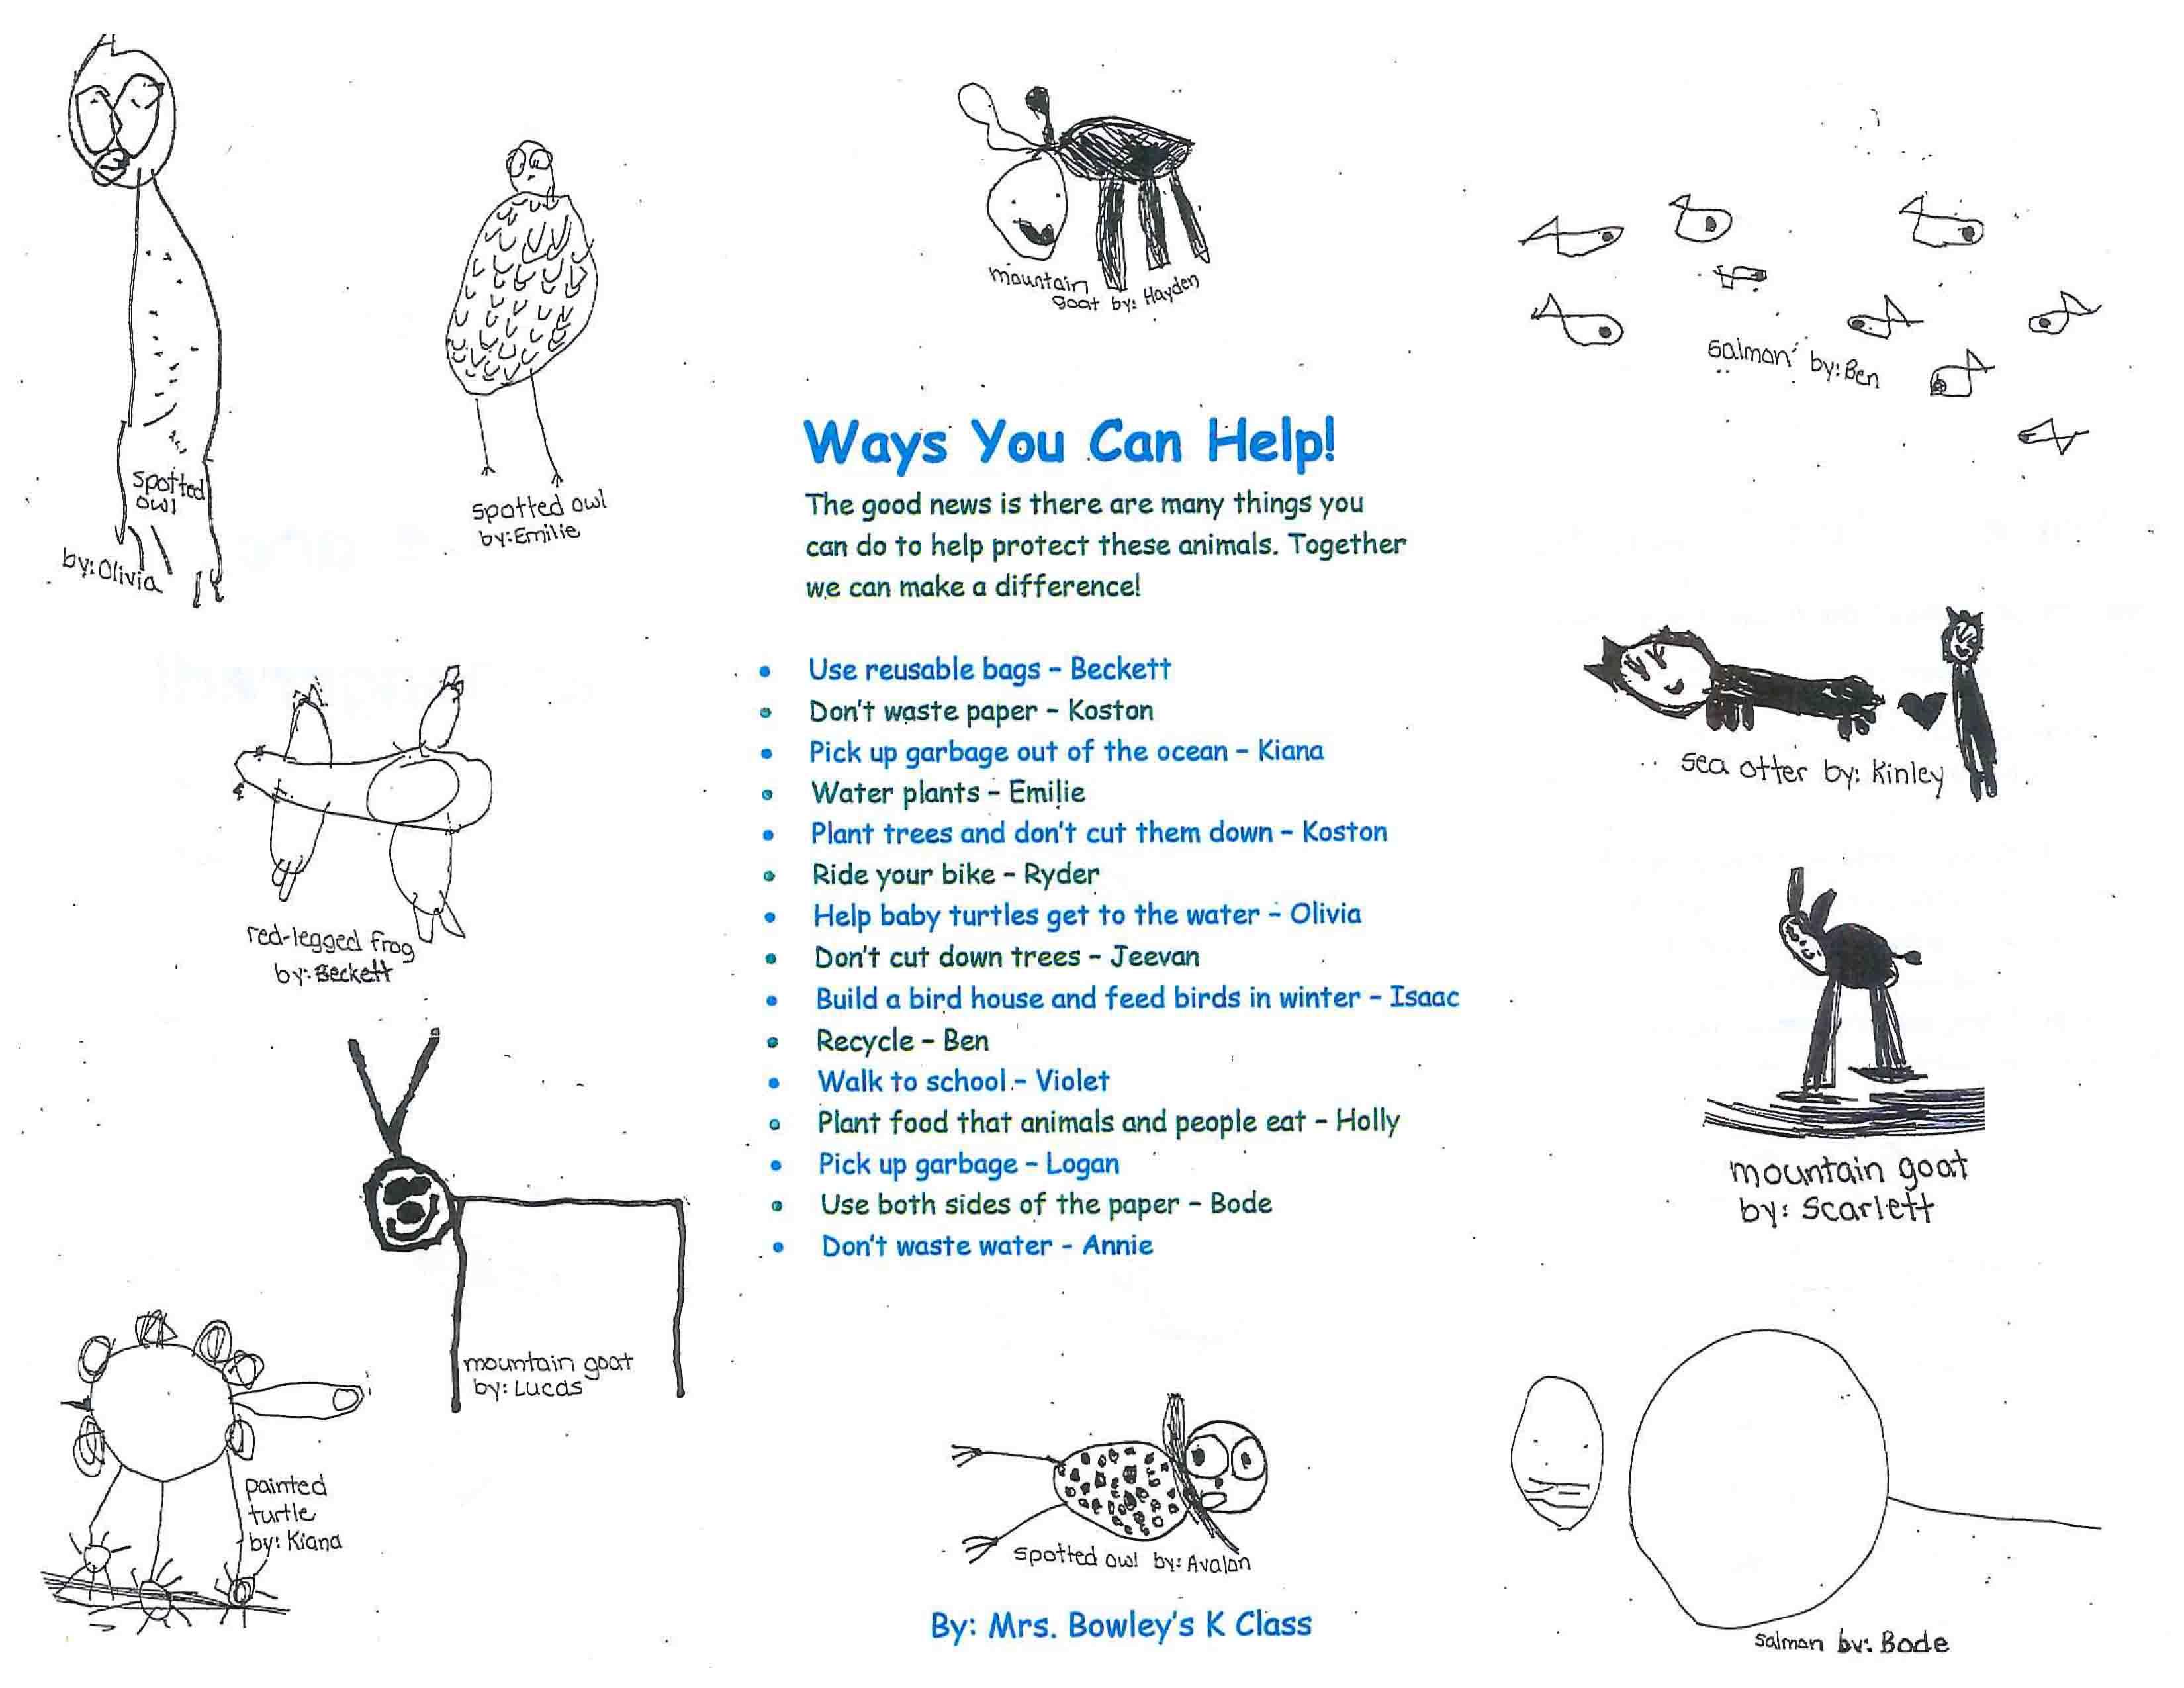 endangered-species-brochure_mrs-bowleys-kindergarten-class-at-brackendale-elementary-2